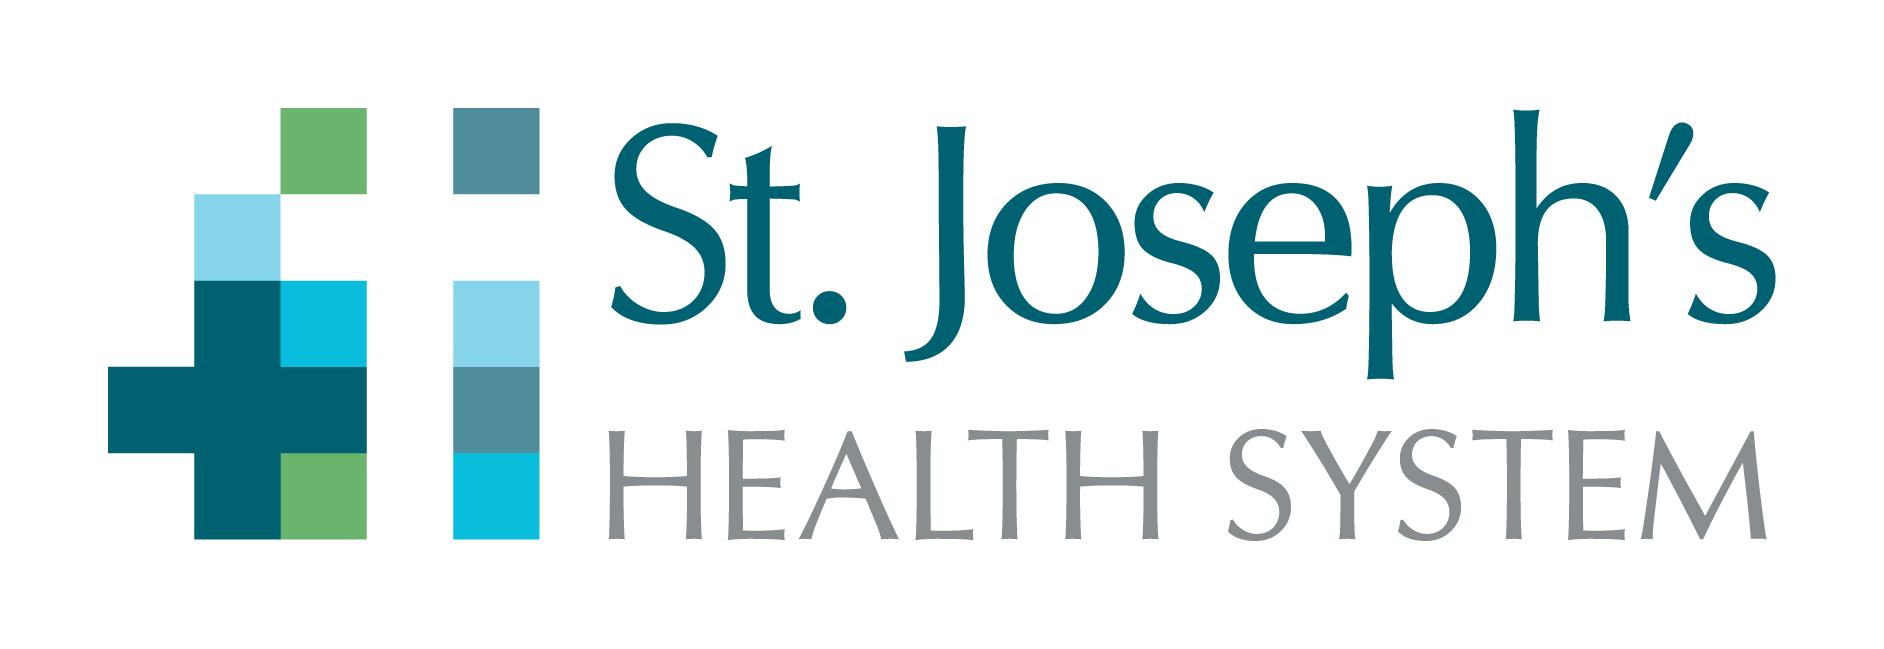 St Joseph Health System.jpg